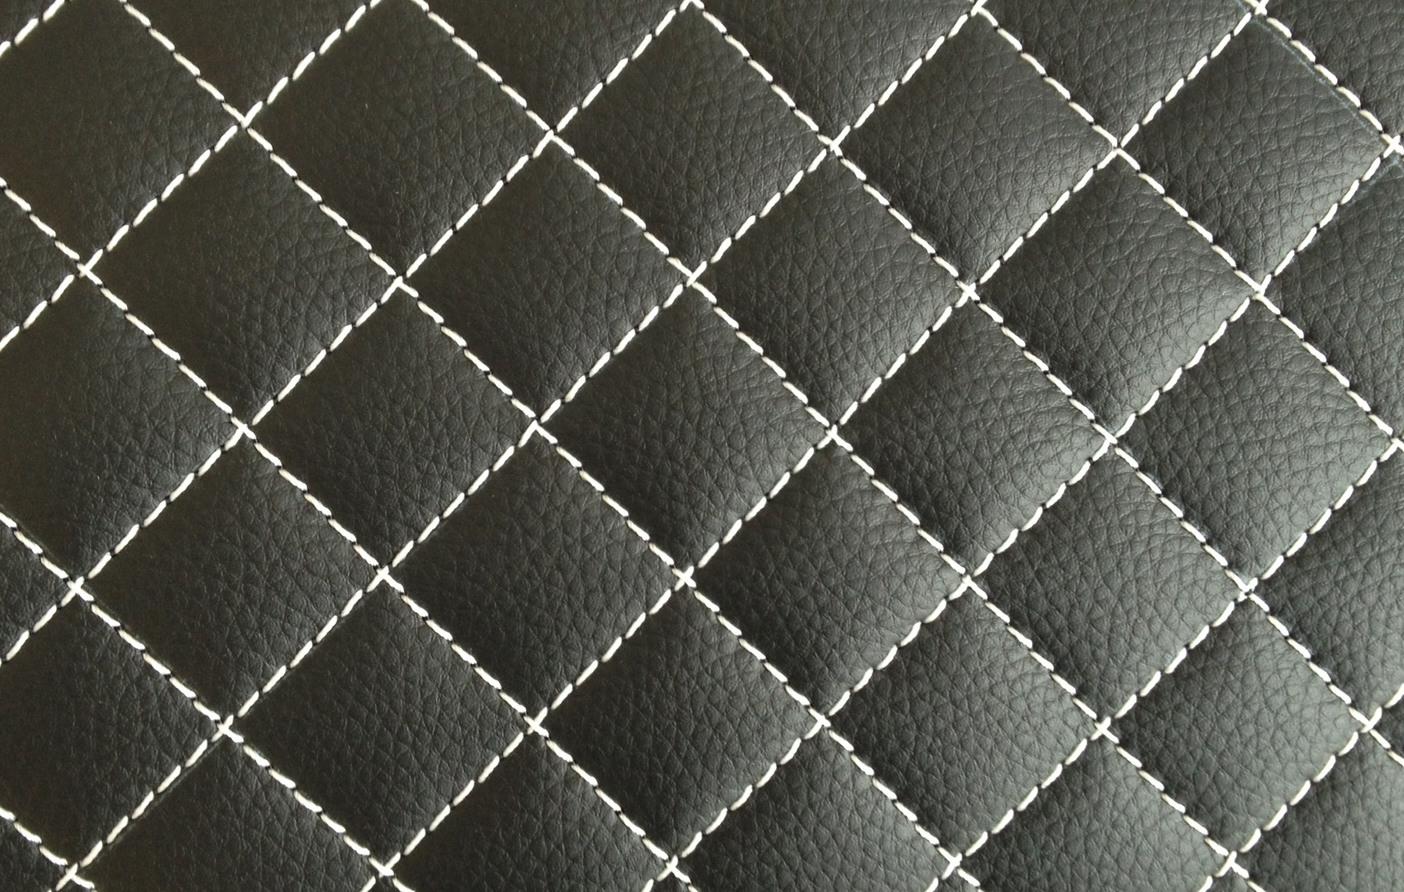 Cafe Racer Scrambler Seat Honda Cx500 Black Leather